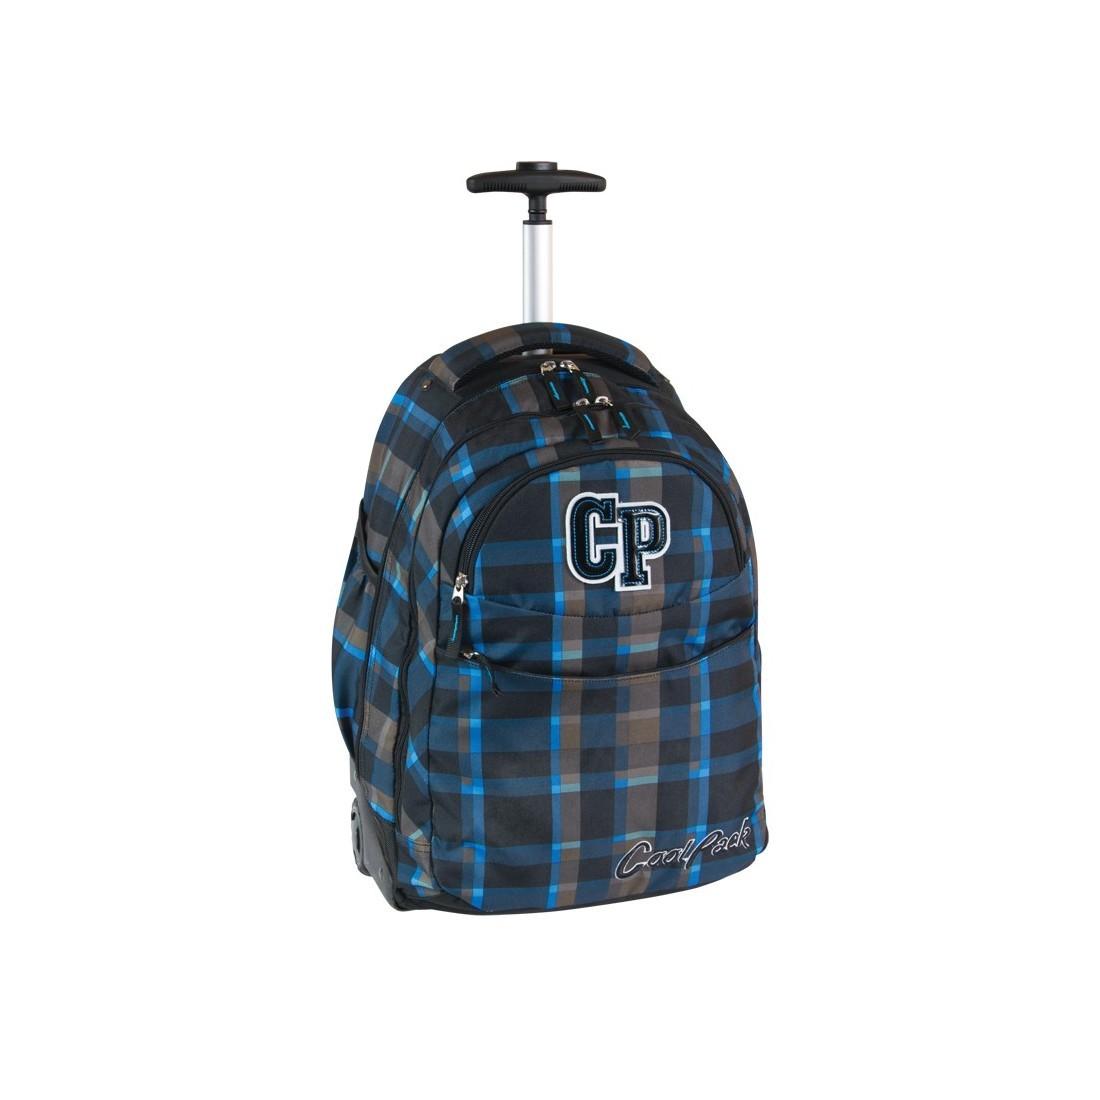 Plecak CoolPack na kółkach dla chłopca w kratkę - RAPID TEXAS CP 073 - plecak-tornister.pl